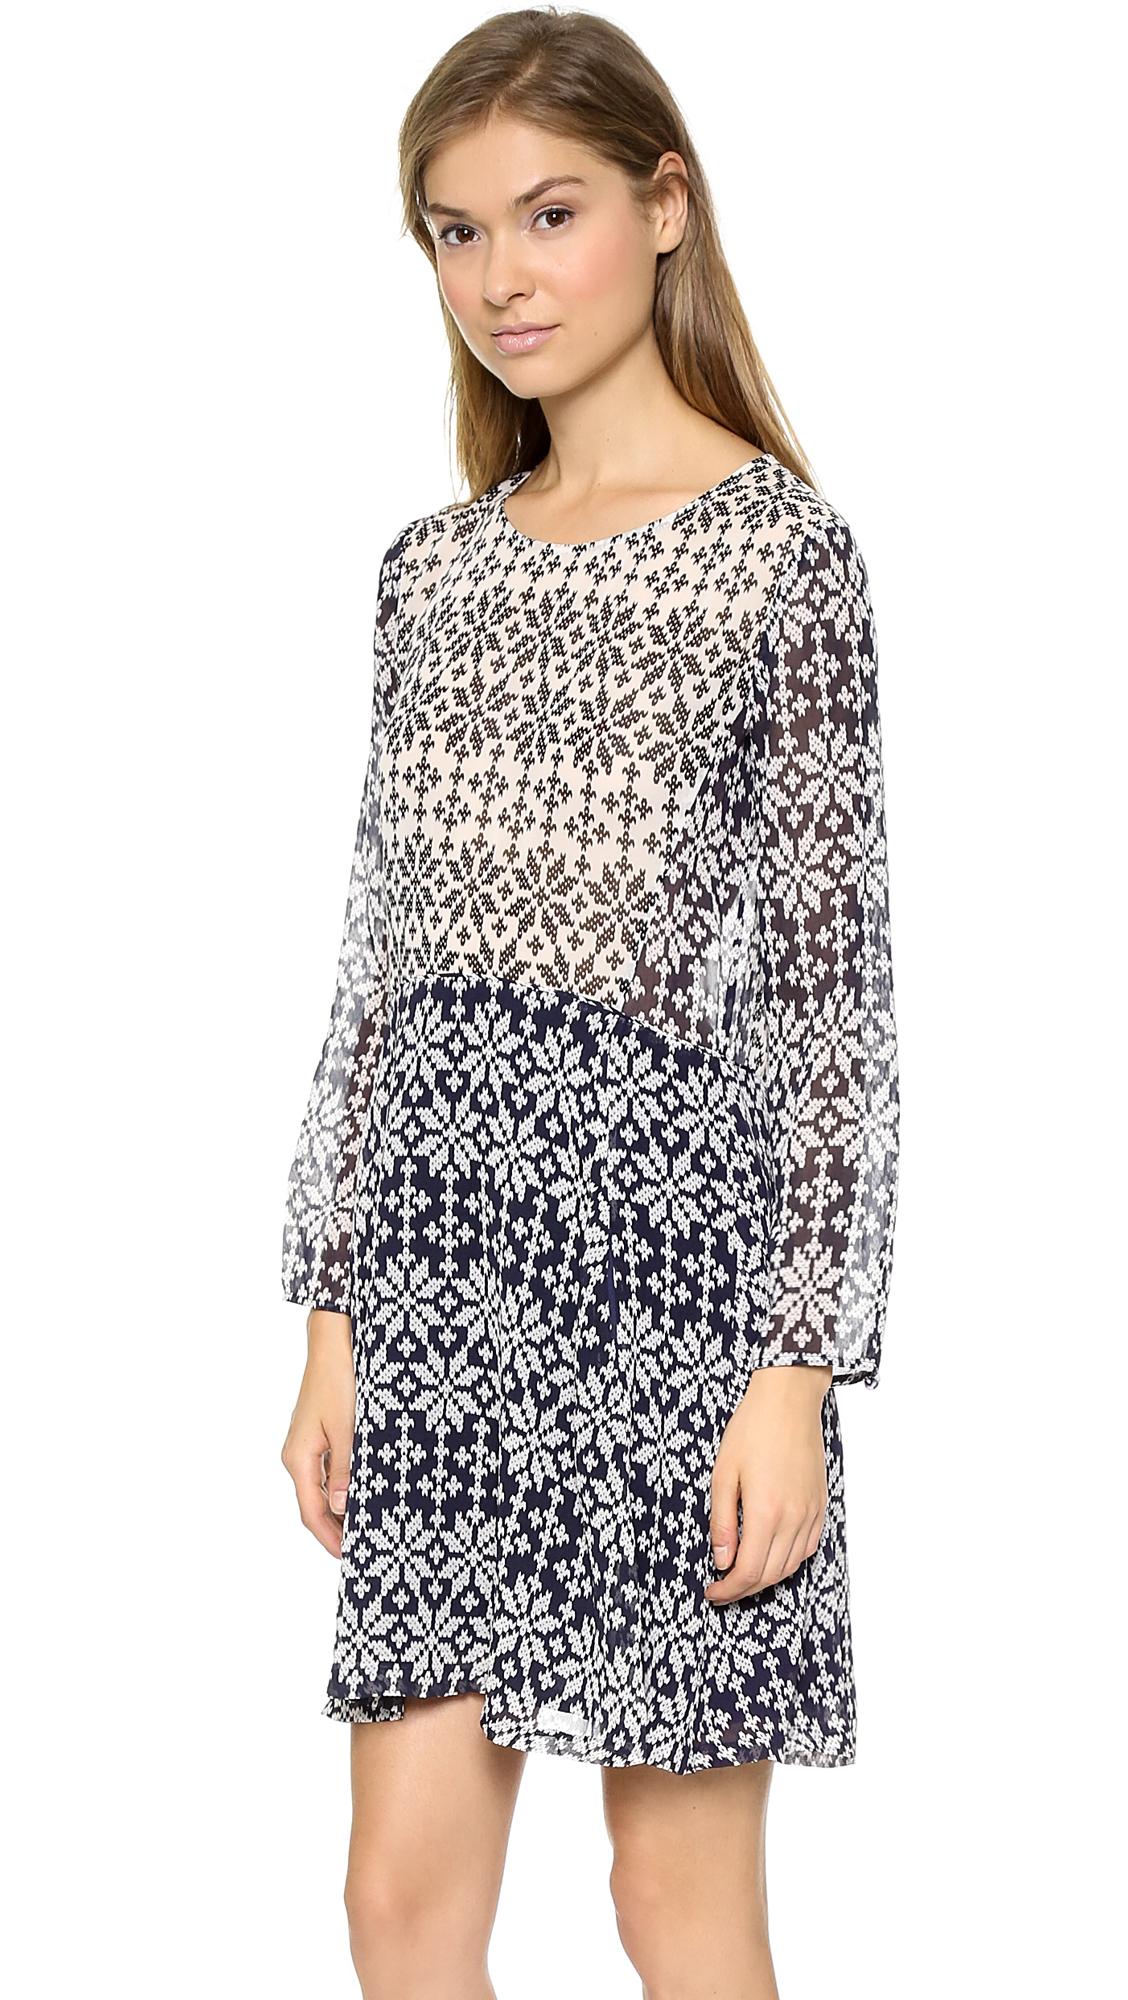 Dress Week Mark 3 Featuring Paul Joe Sister Multicolour Islande Knit Print